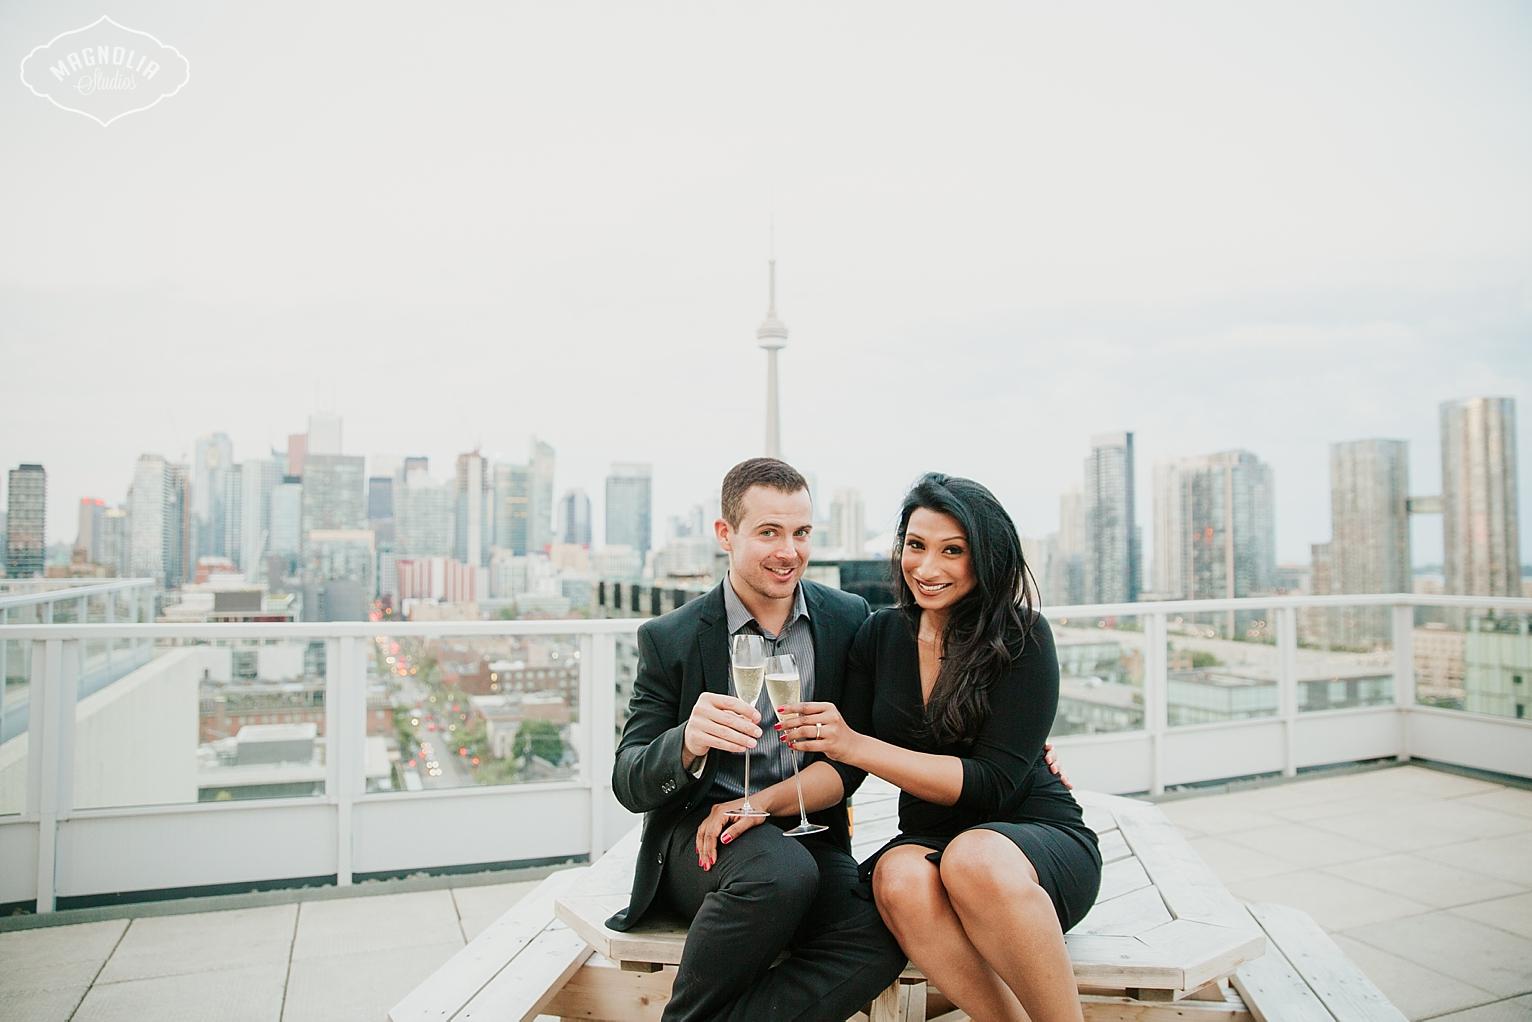 Toronto Rooftop Engagement Photos